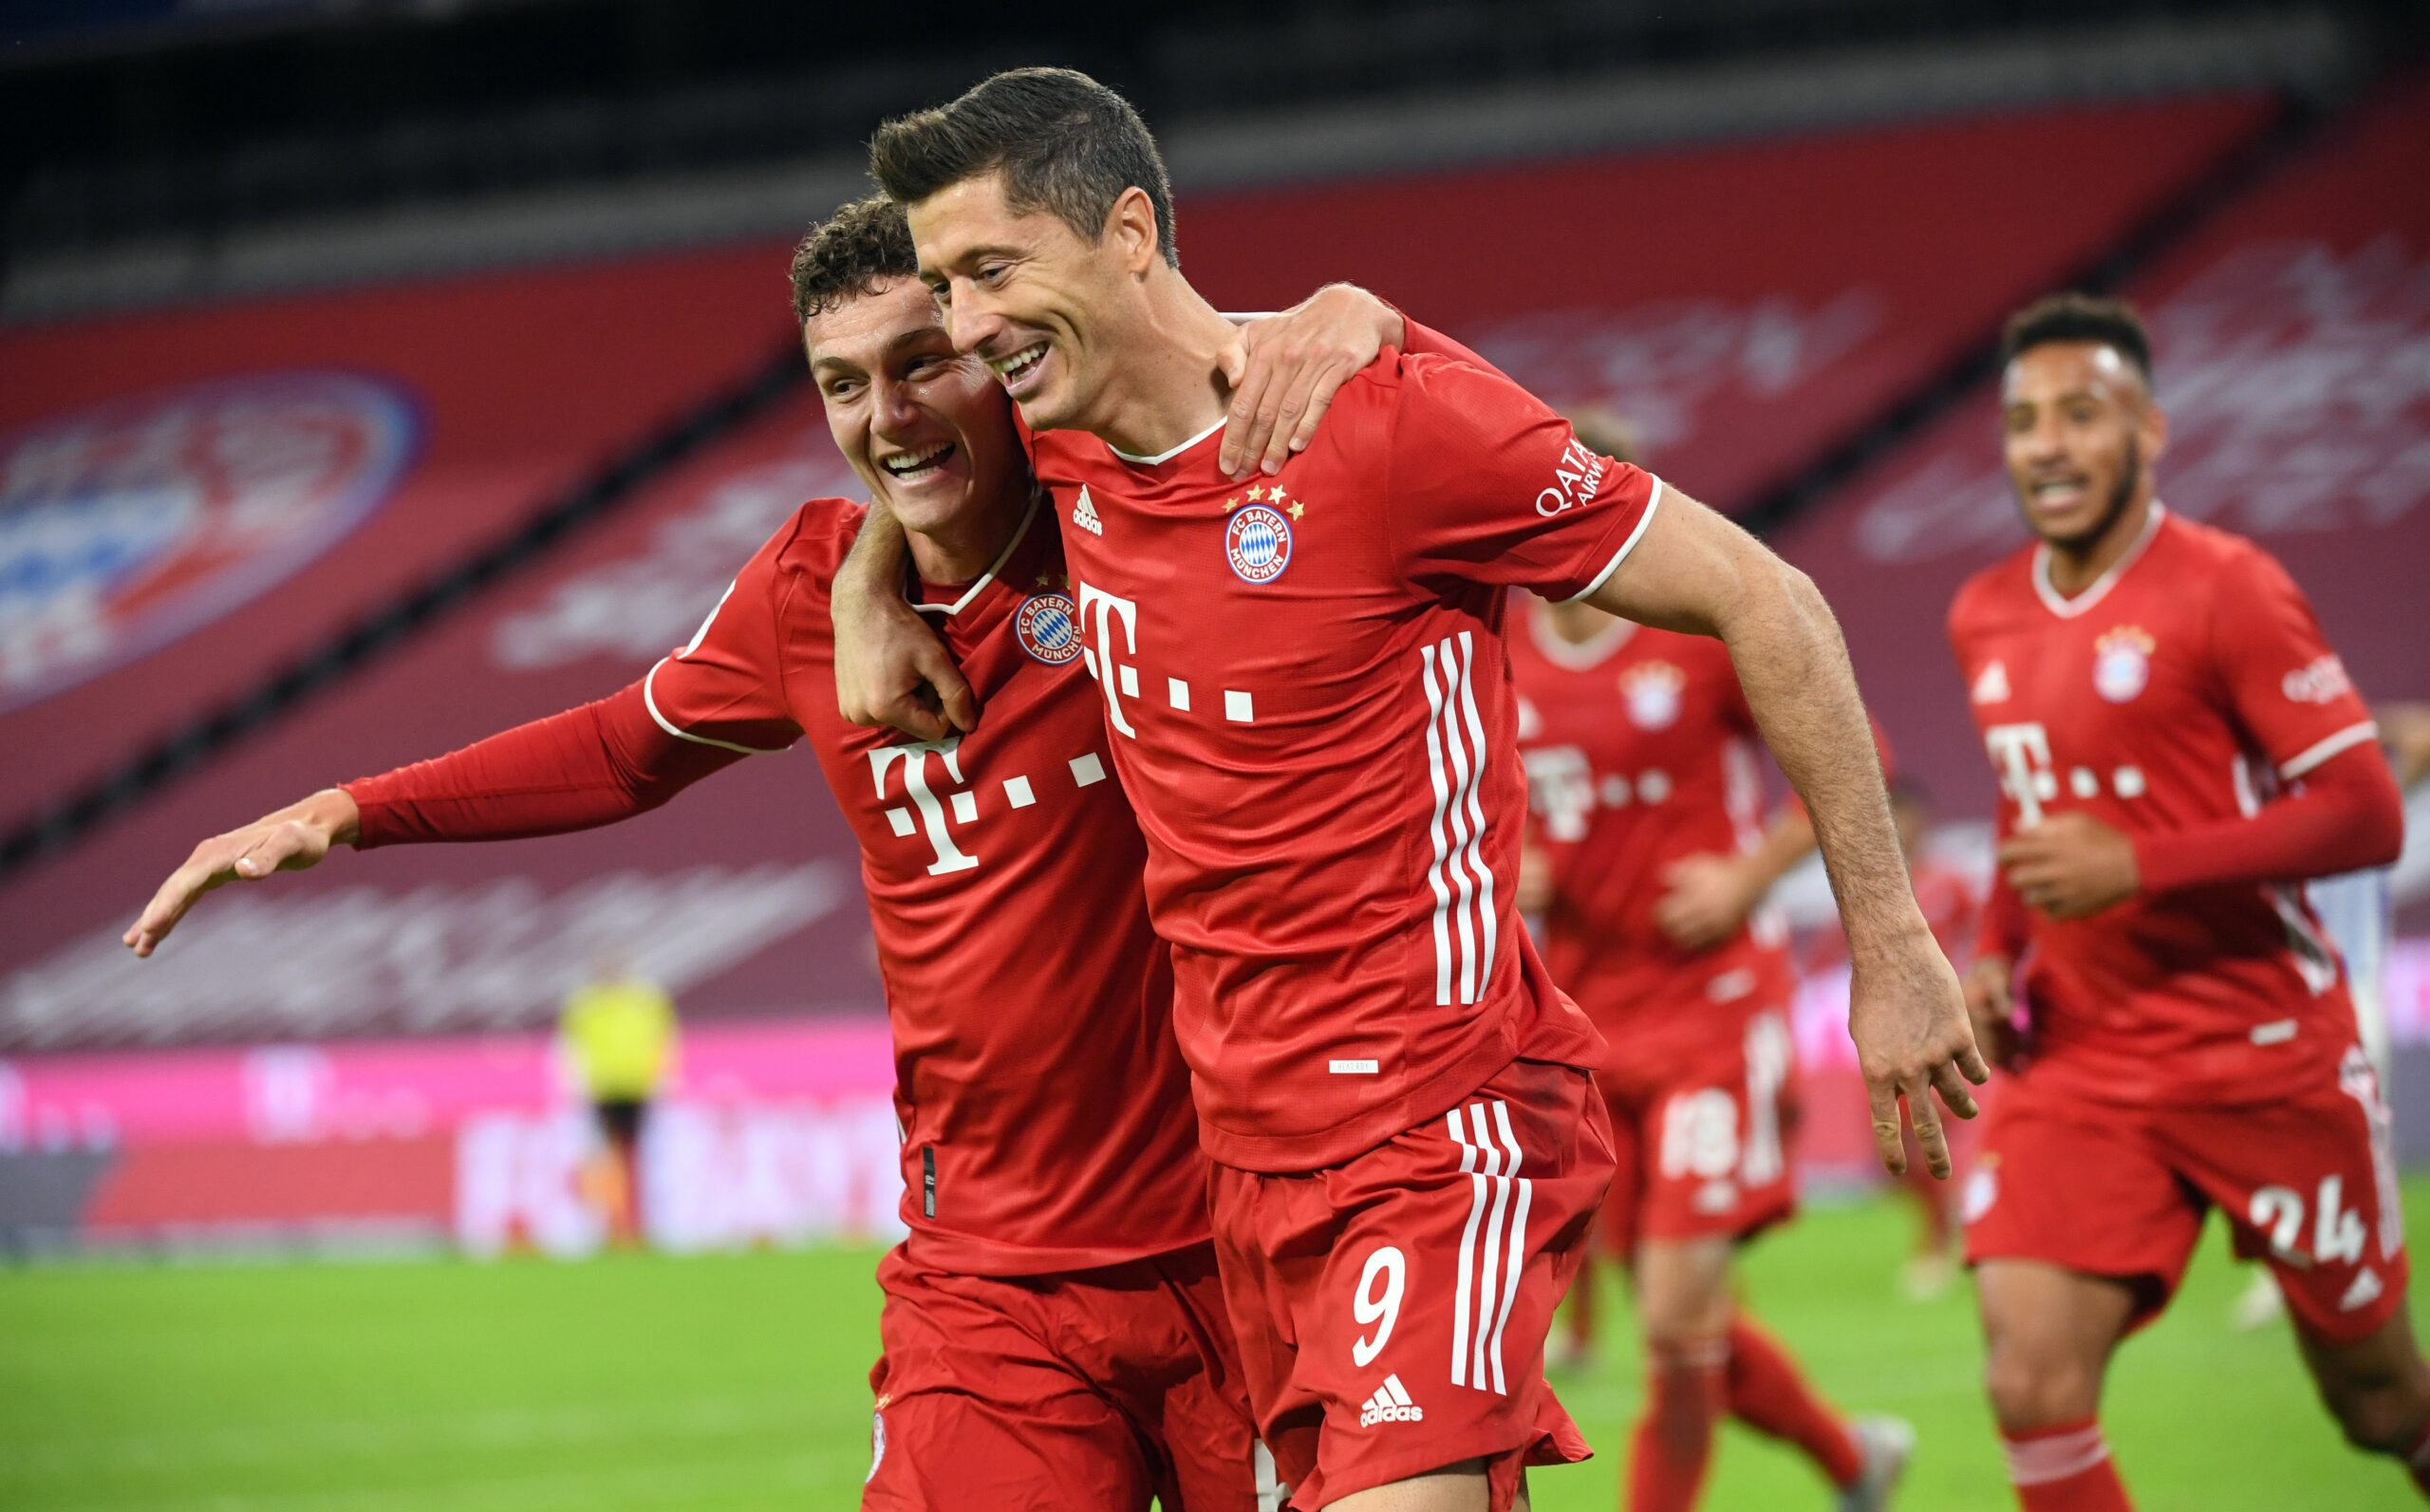 Lewandowski i Pavard celebren un gol del Bayern | Europa Press